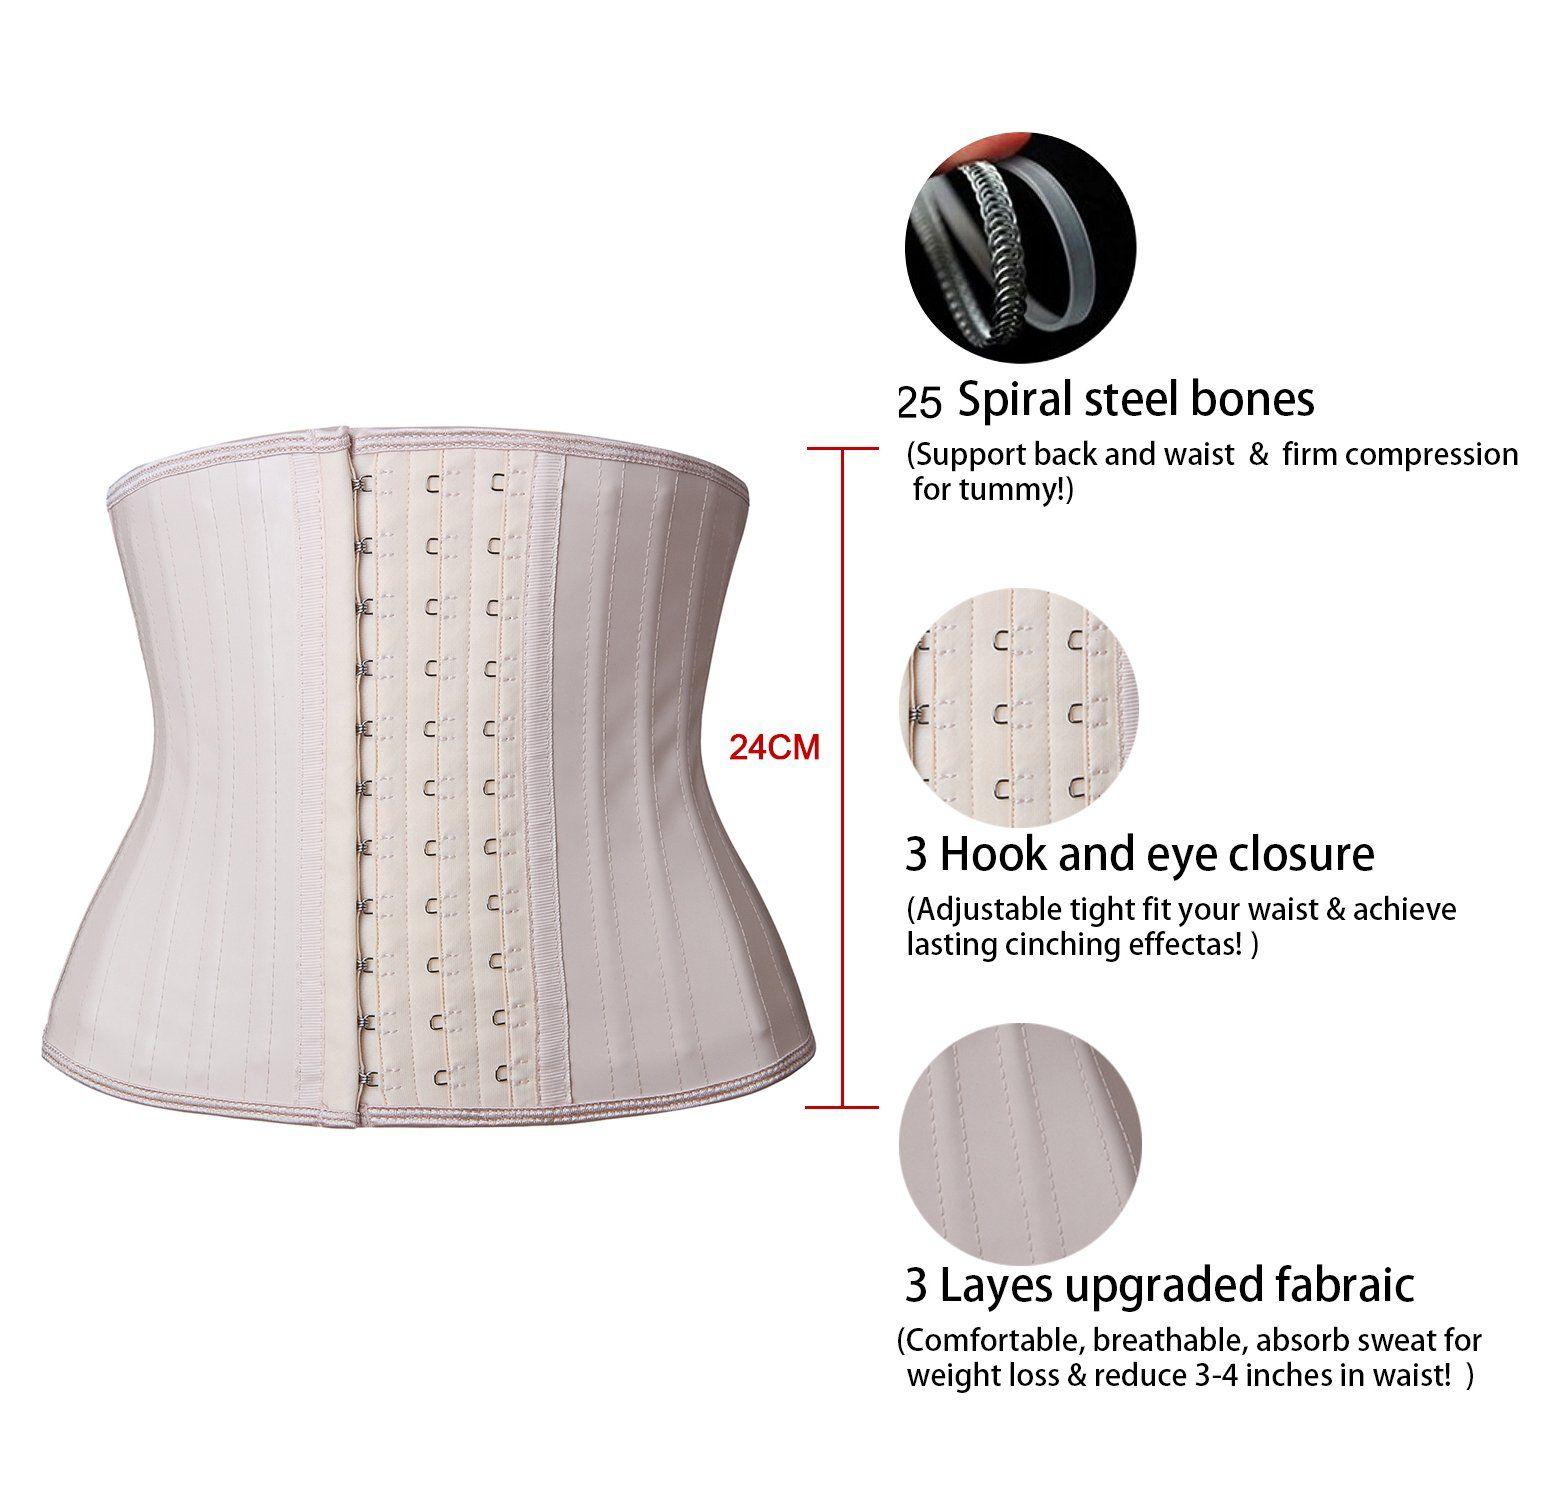 a49c8b0b1bf YIANNA Womens Classic Underbust Latex Sports Girdle Short Torso Waist  Training Corsets For Weight Loss Hourglass Body Shaper Fat Burner  YA110299Beige3XL     ...